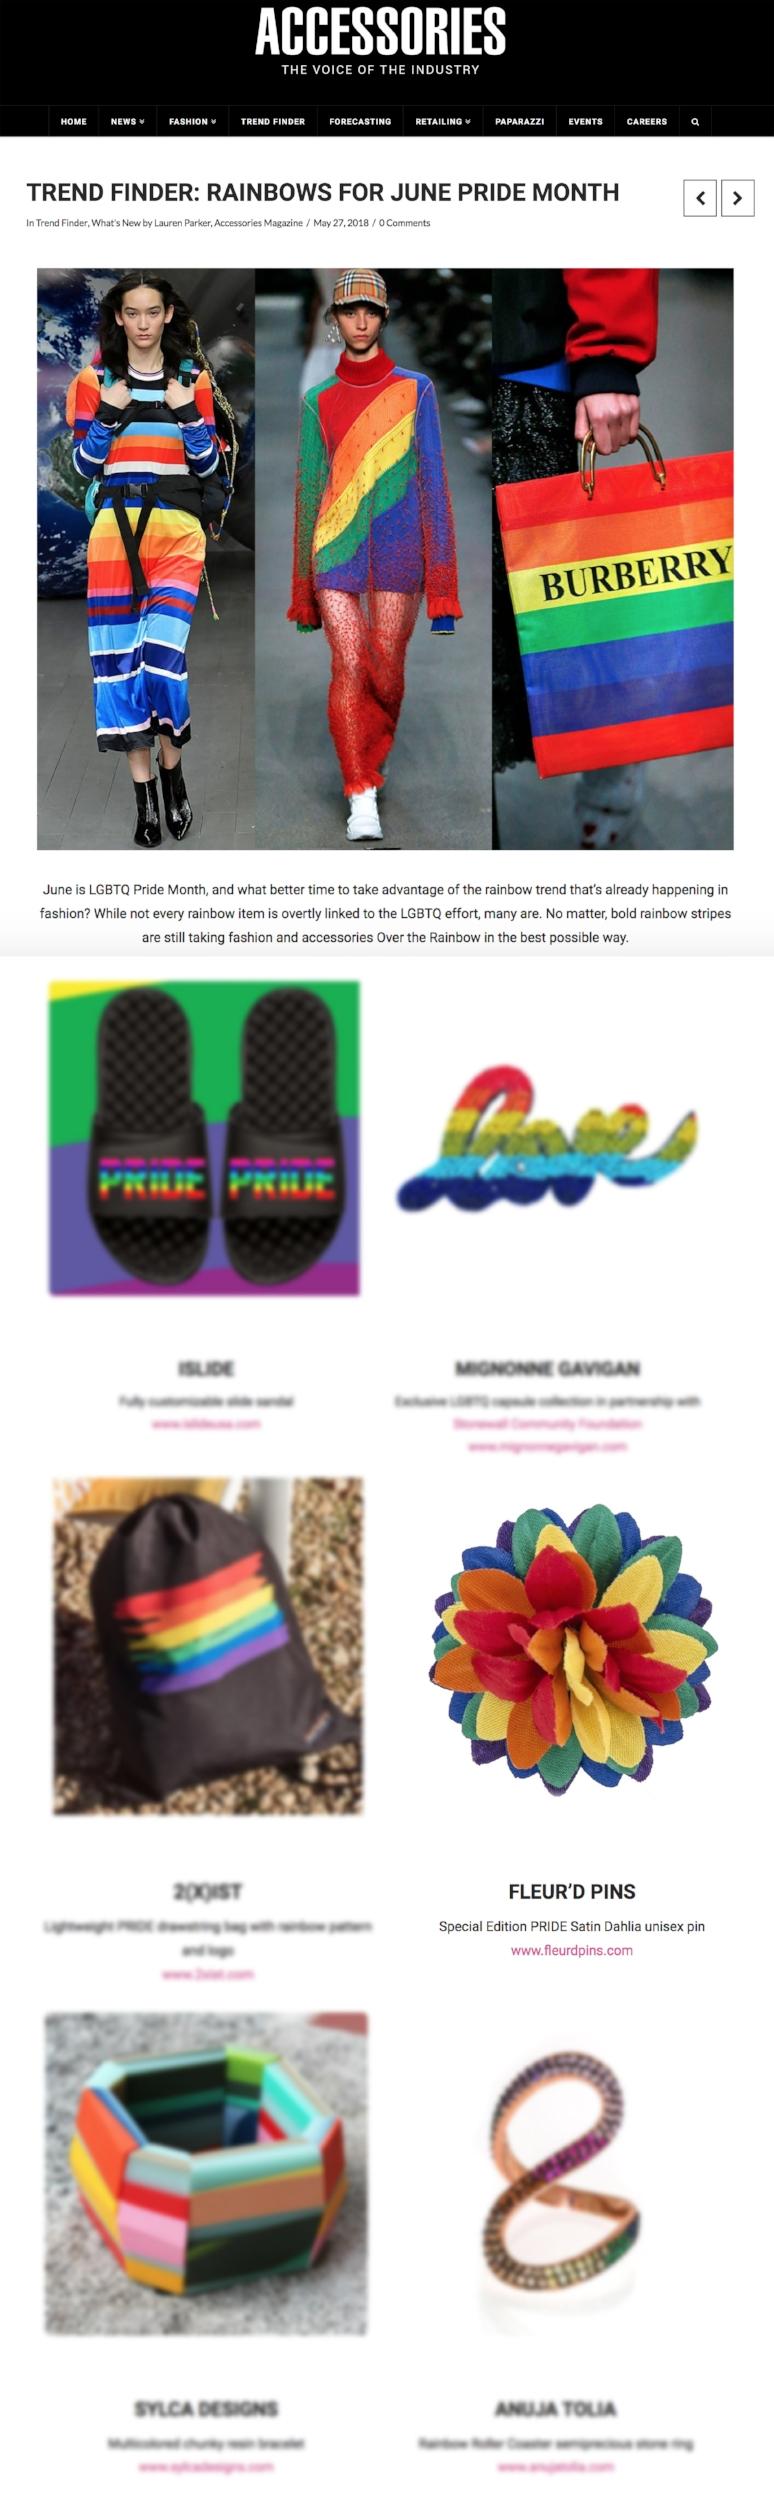 Accessories Magazine PRIDE write up - Fleur'd Pins Rainbow Fleur.jpg